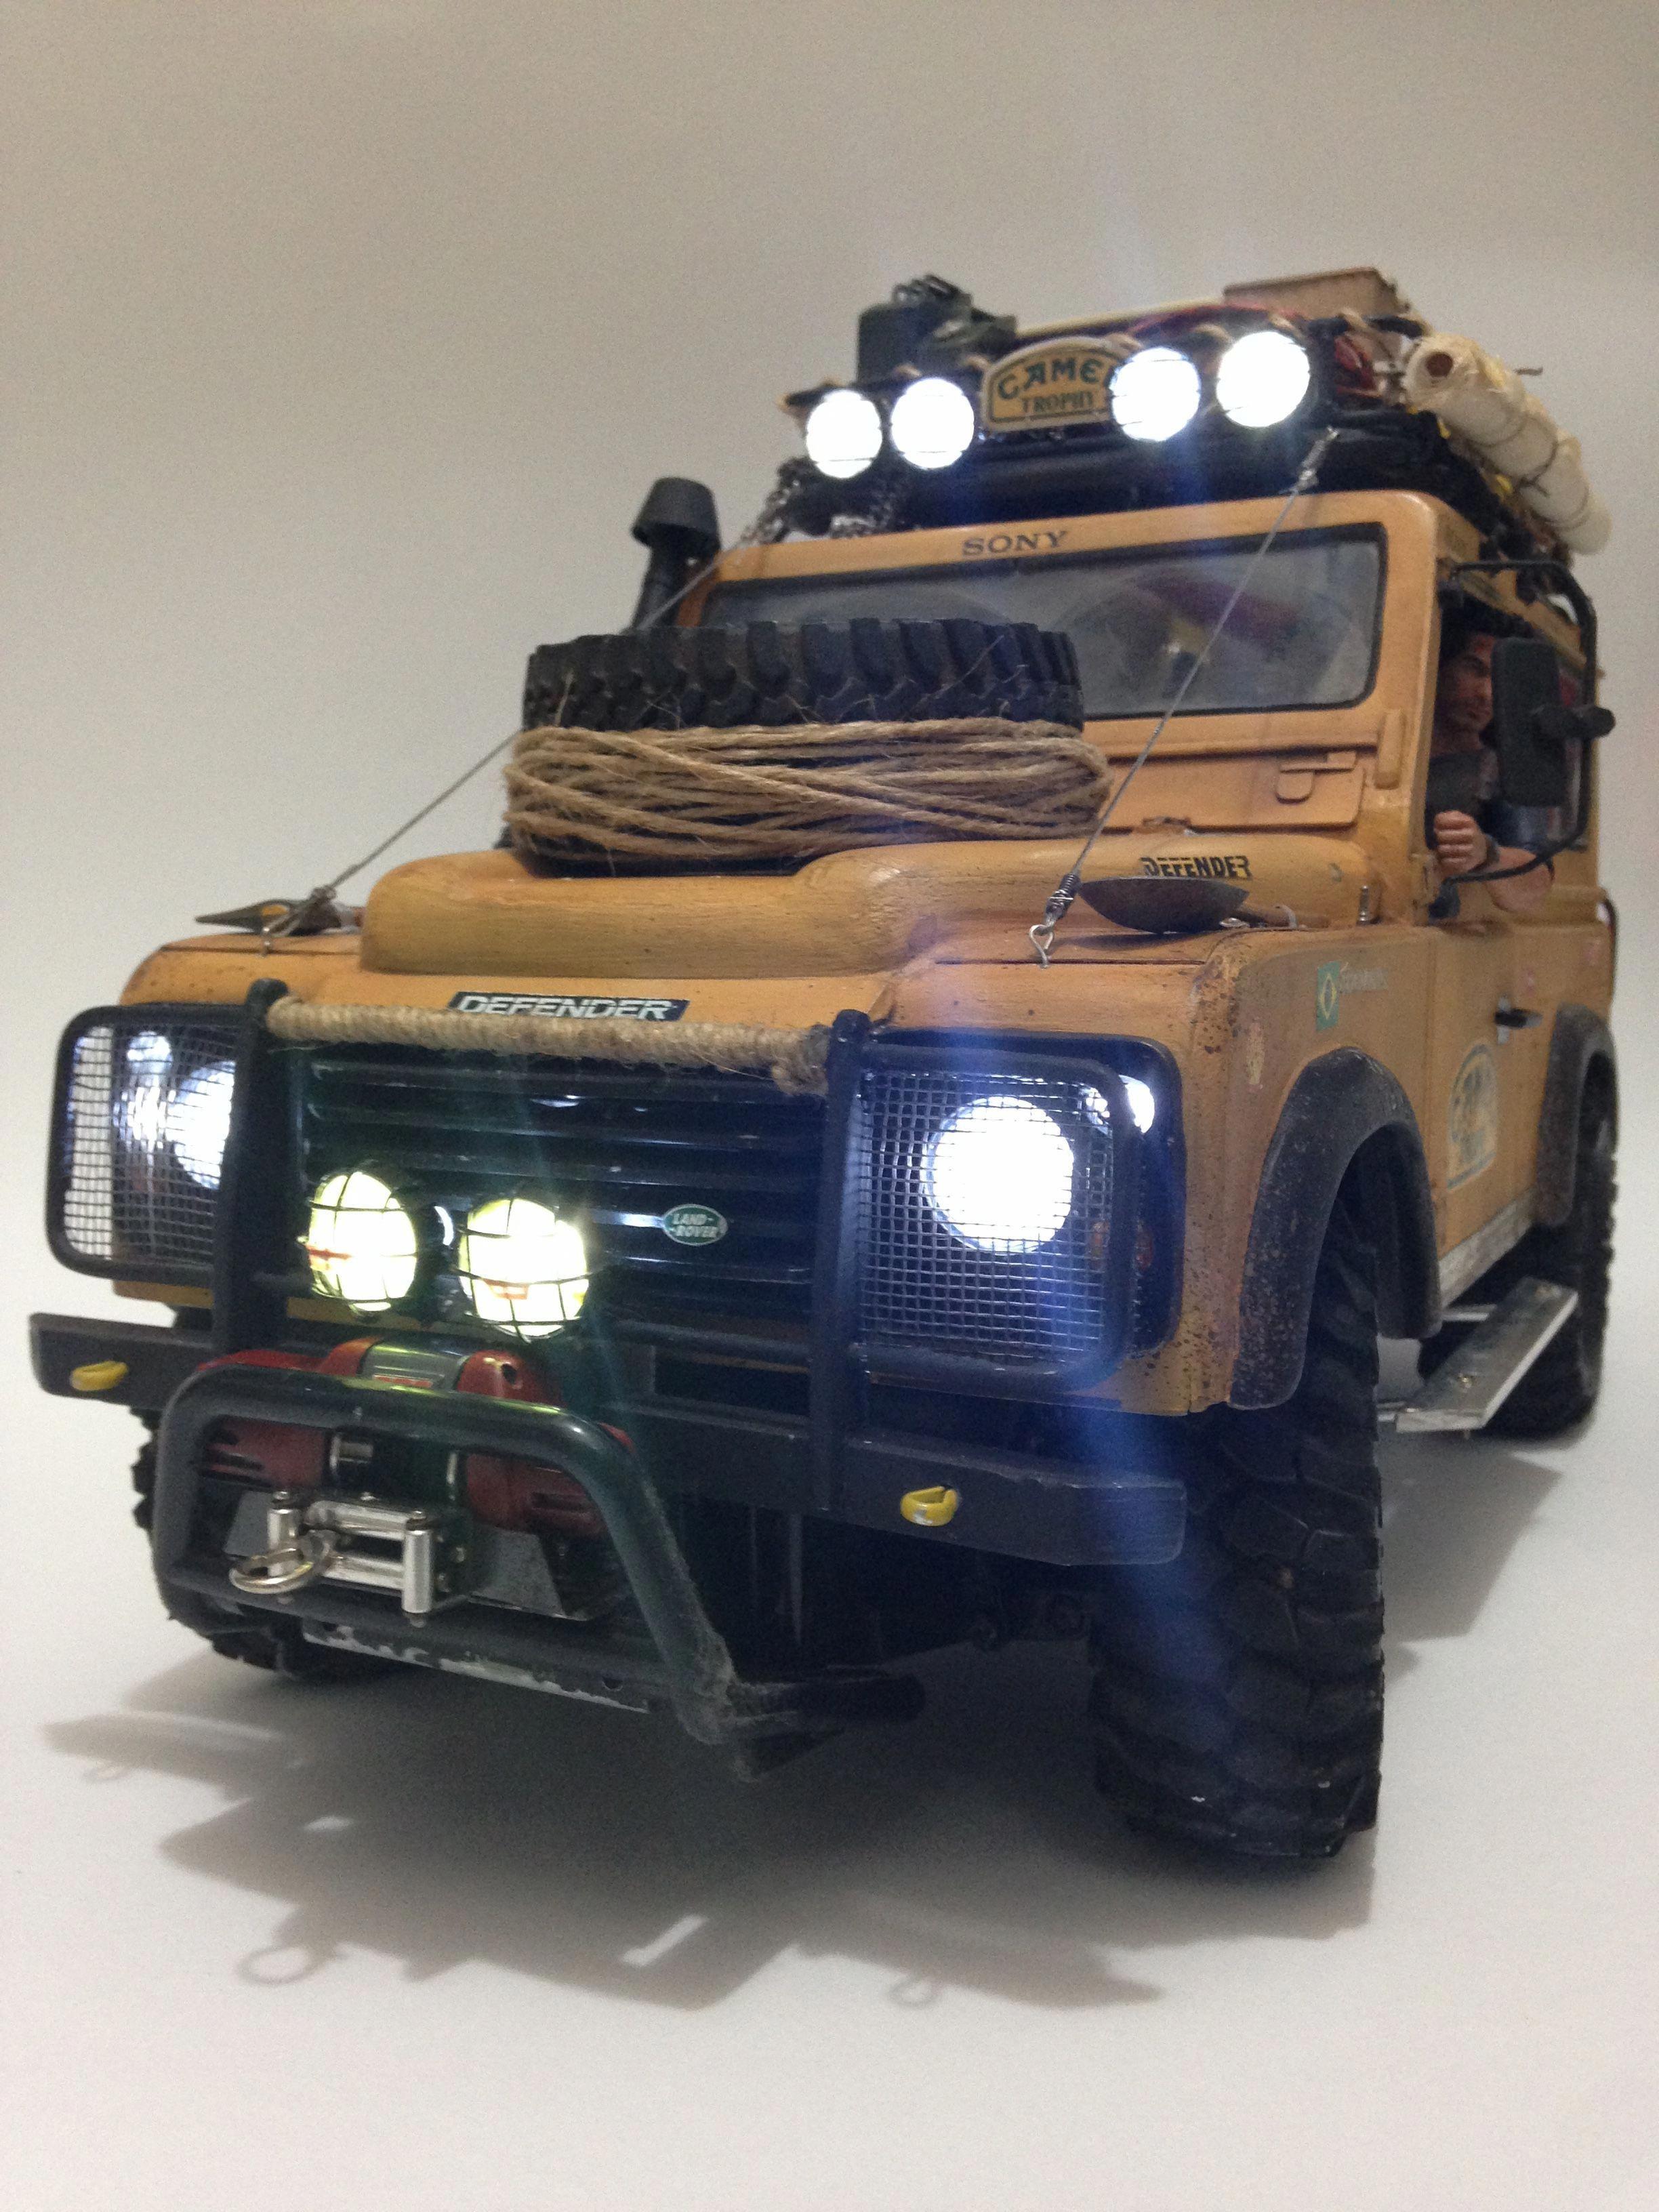 Land Rover Camel Trophy CC01 Tamiya RC Crawler #radiocontrolledcars